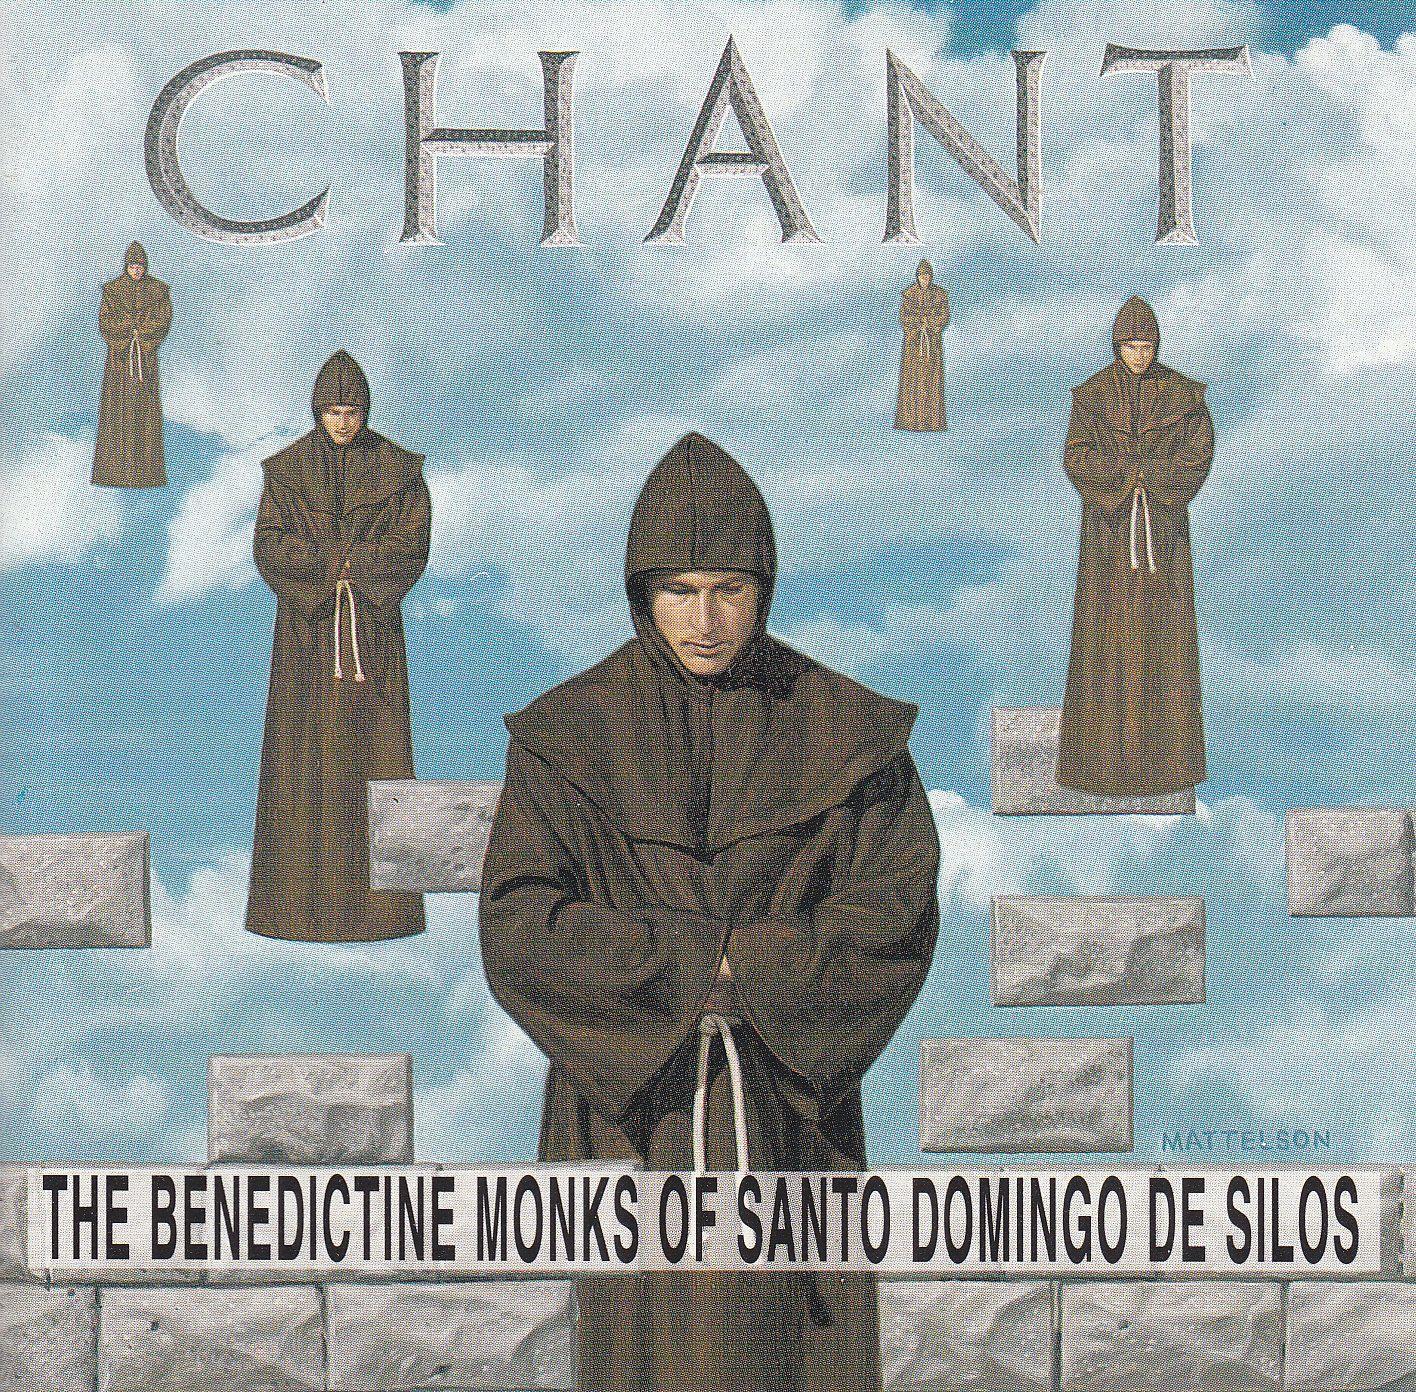 The Benedictine Monks of Santo Domingo De Silos Chant